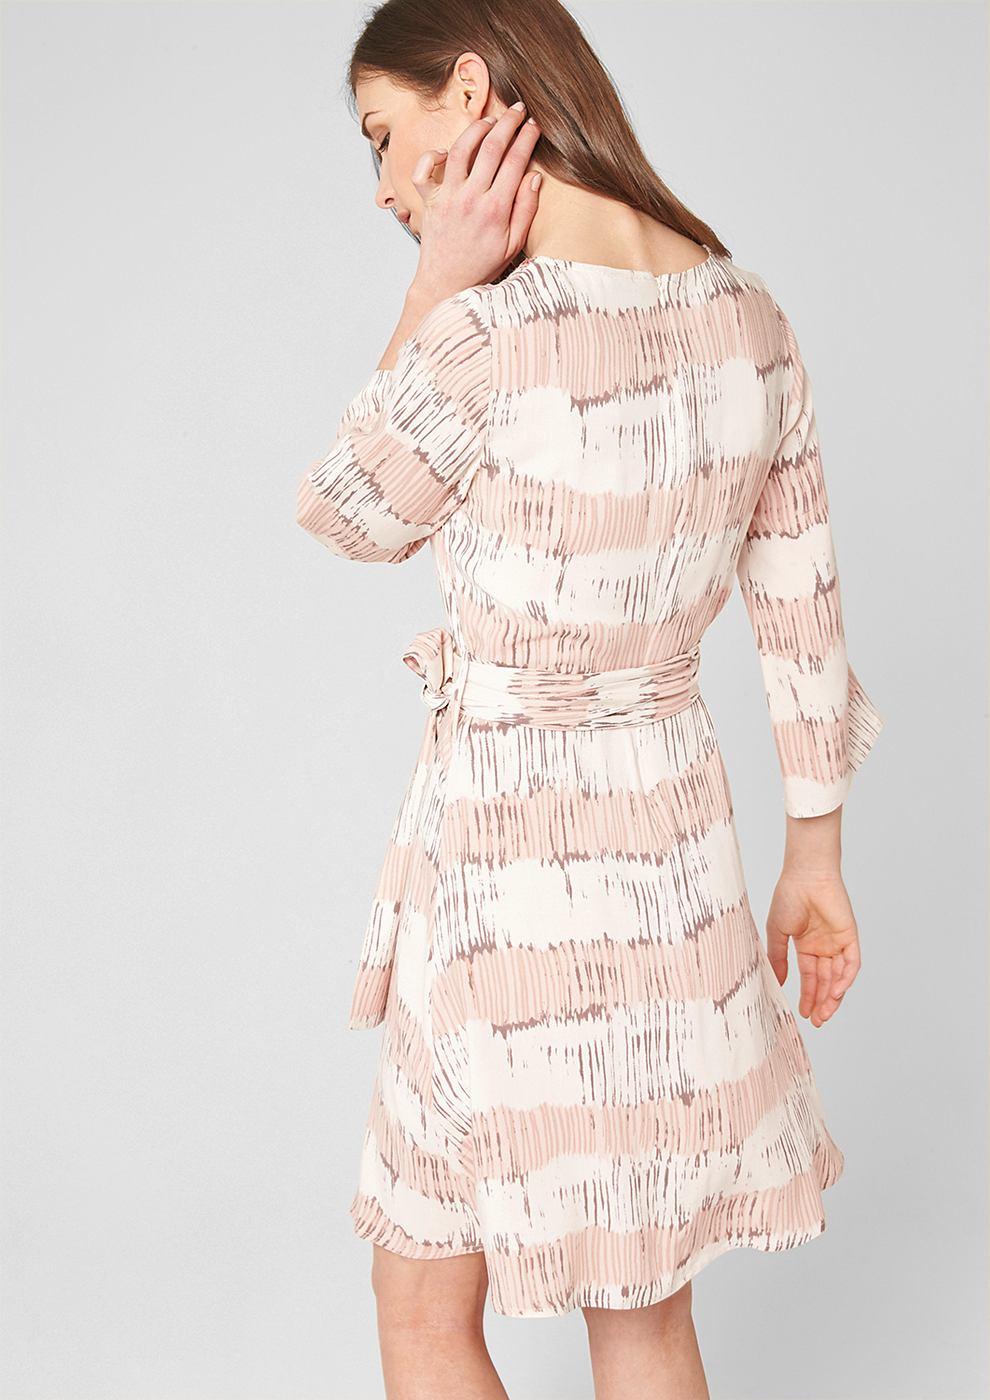 s.Oliver Premium Viscose jurk met pailletjes roze